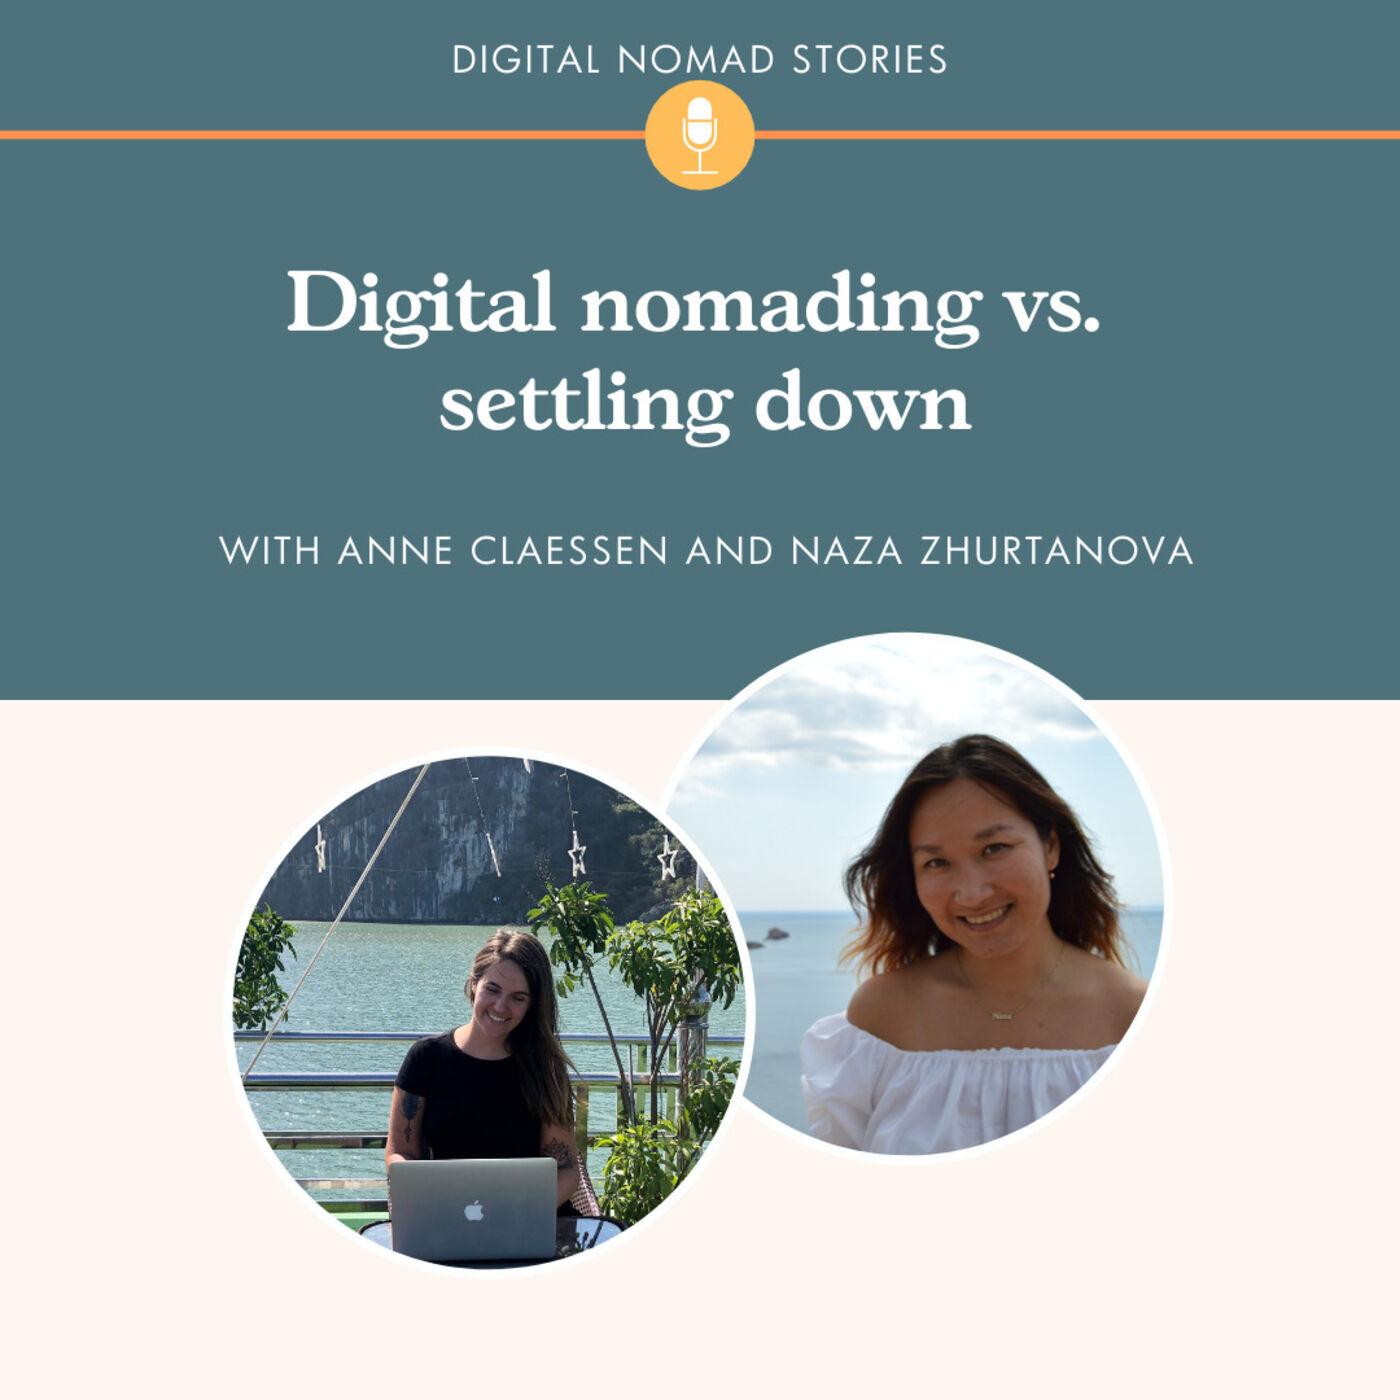 Digital nomading vs. settling down, with Naza Zhurtanova